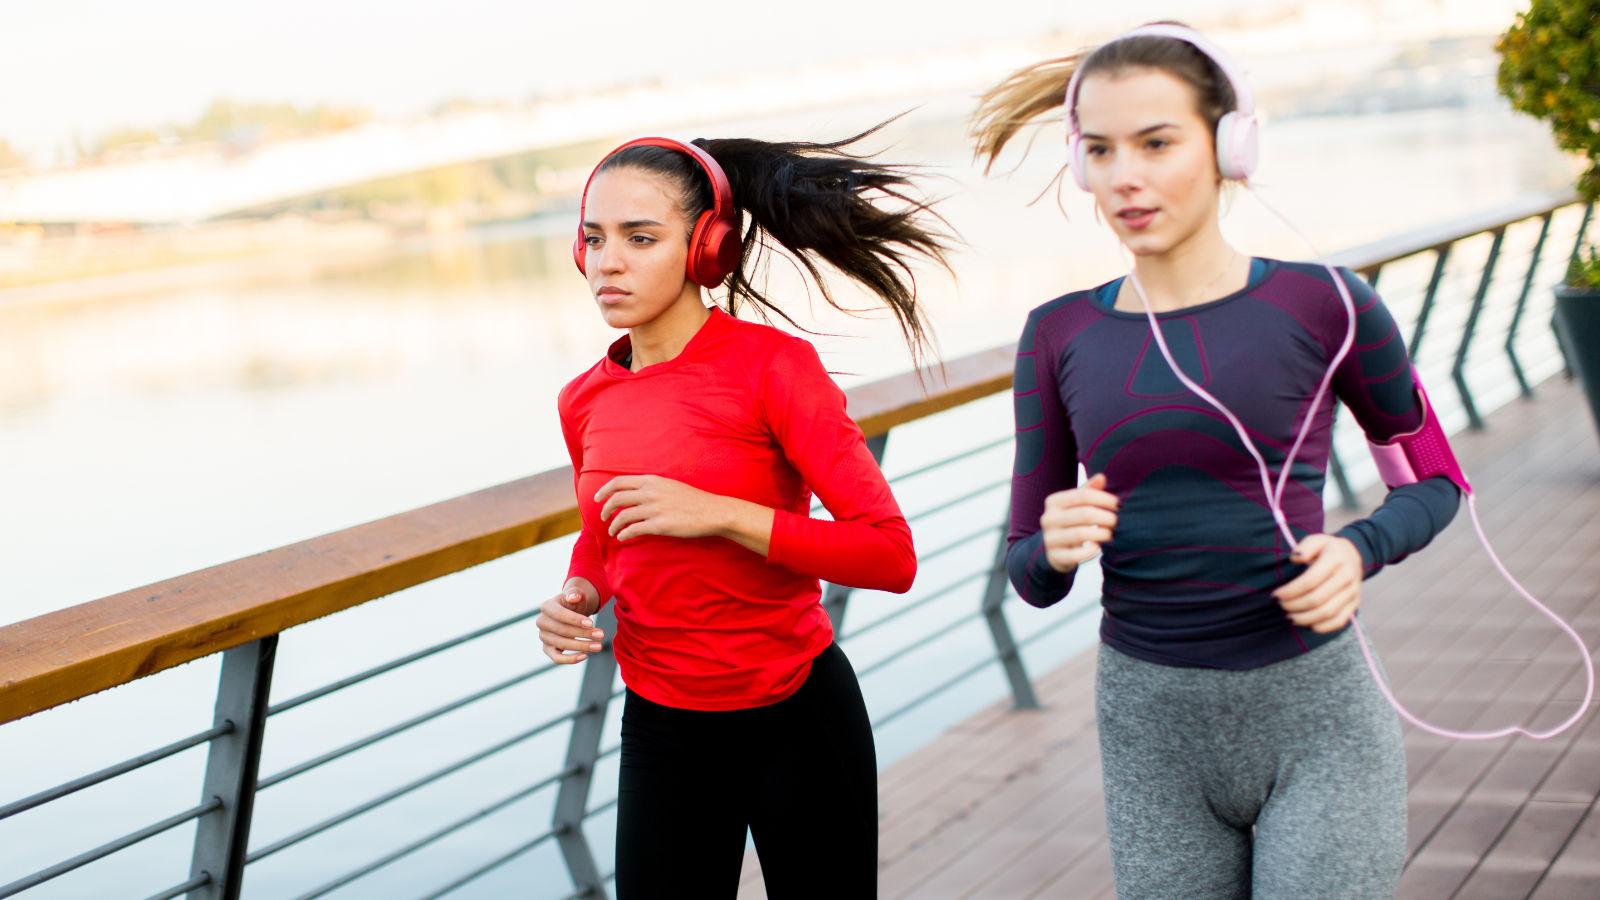 Image result for Runners Oppose USATF Headphone Ban